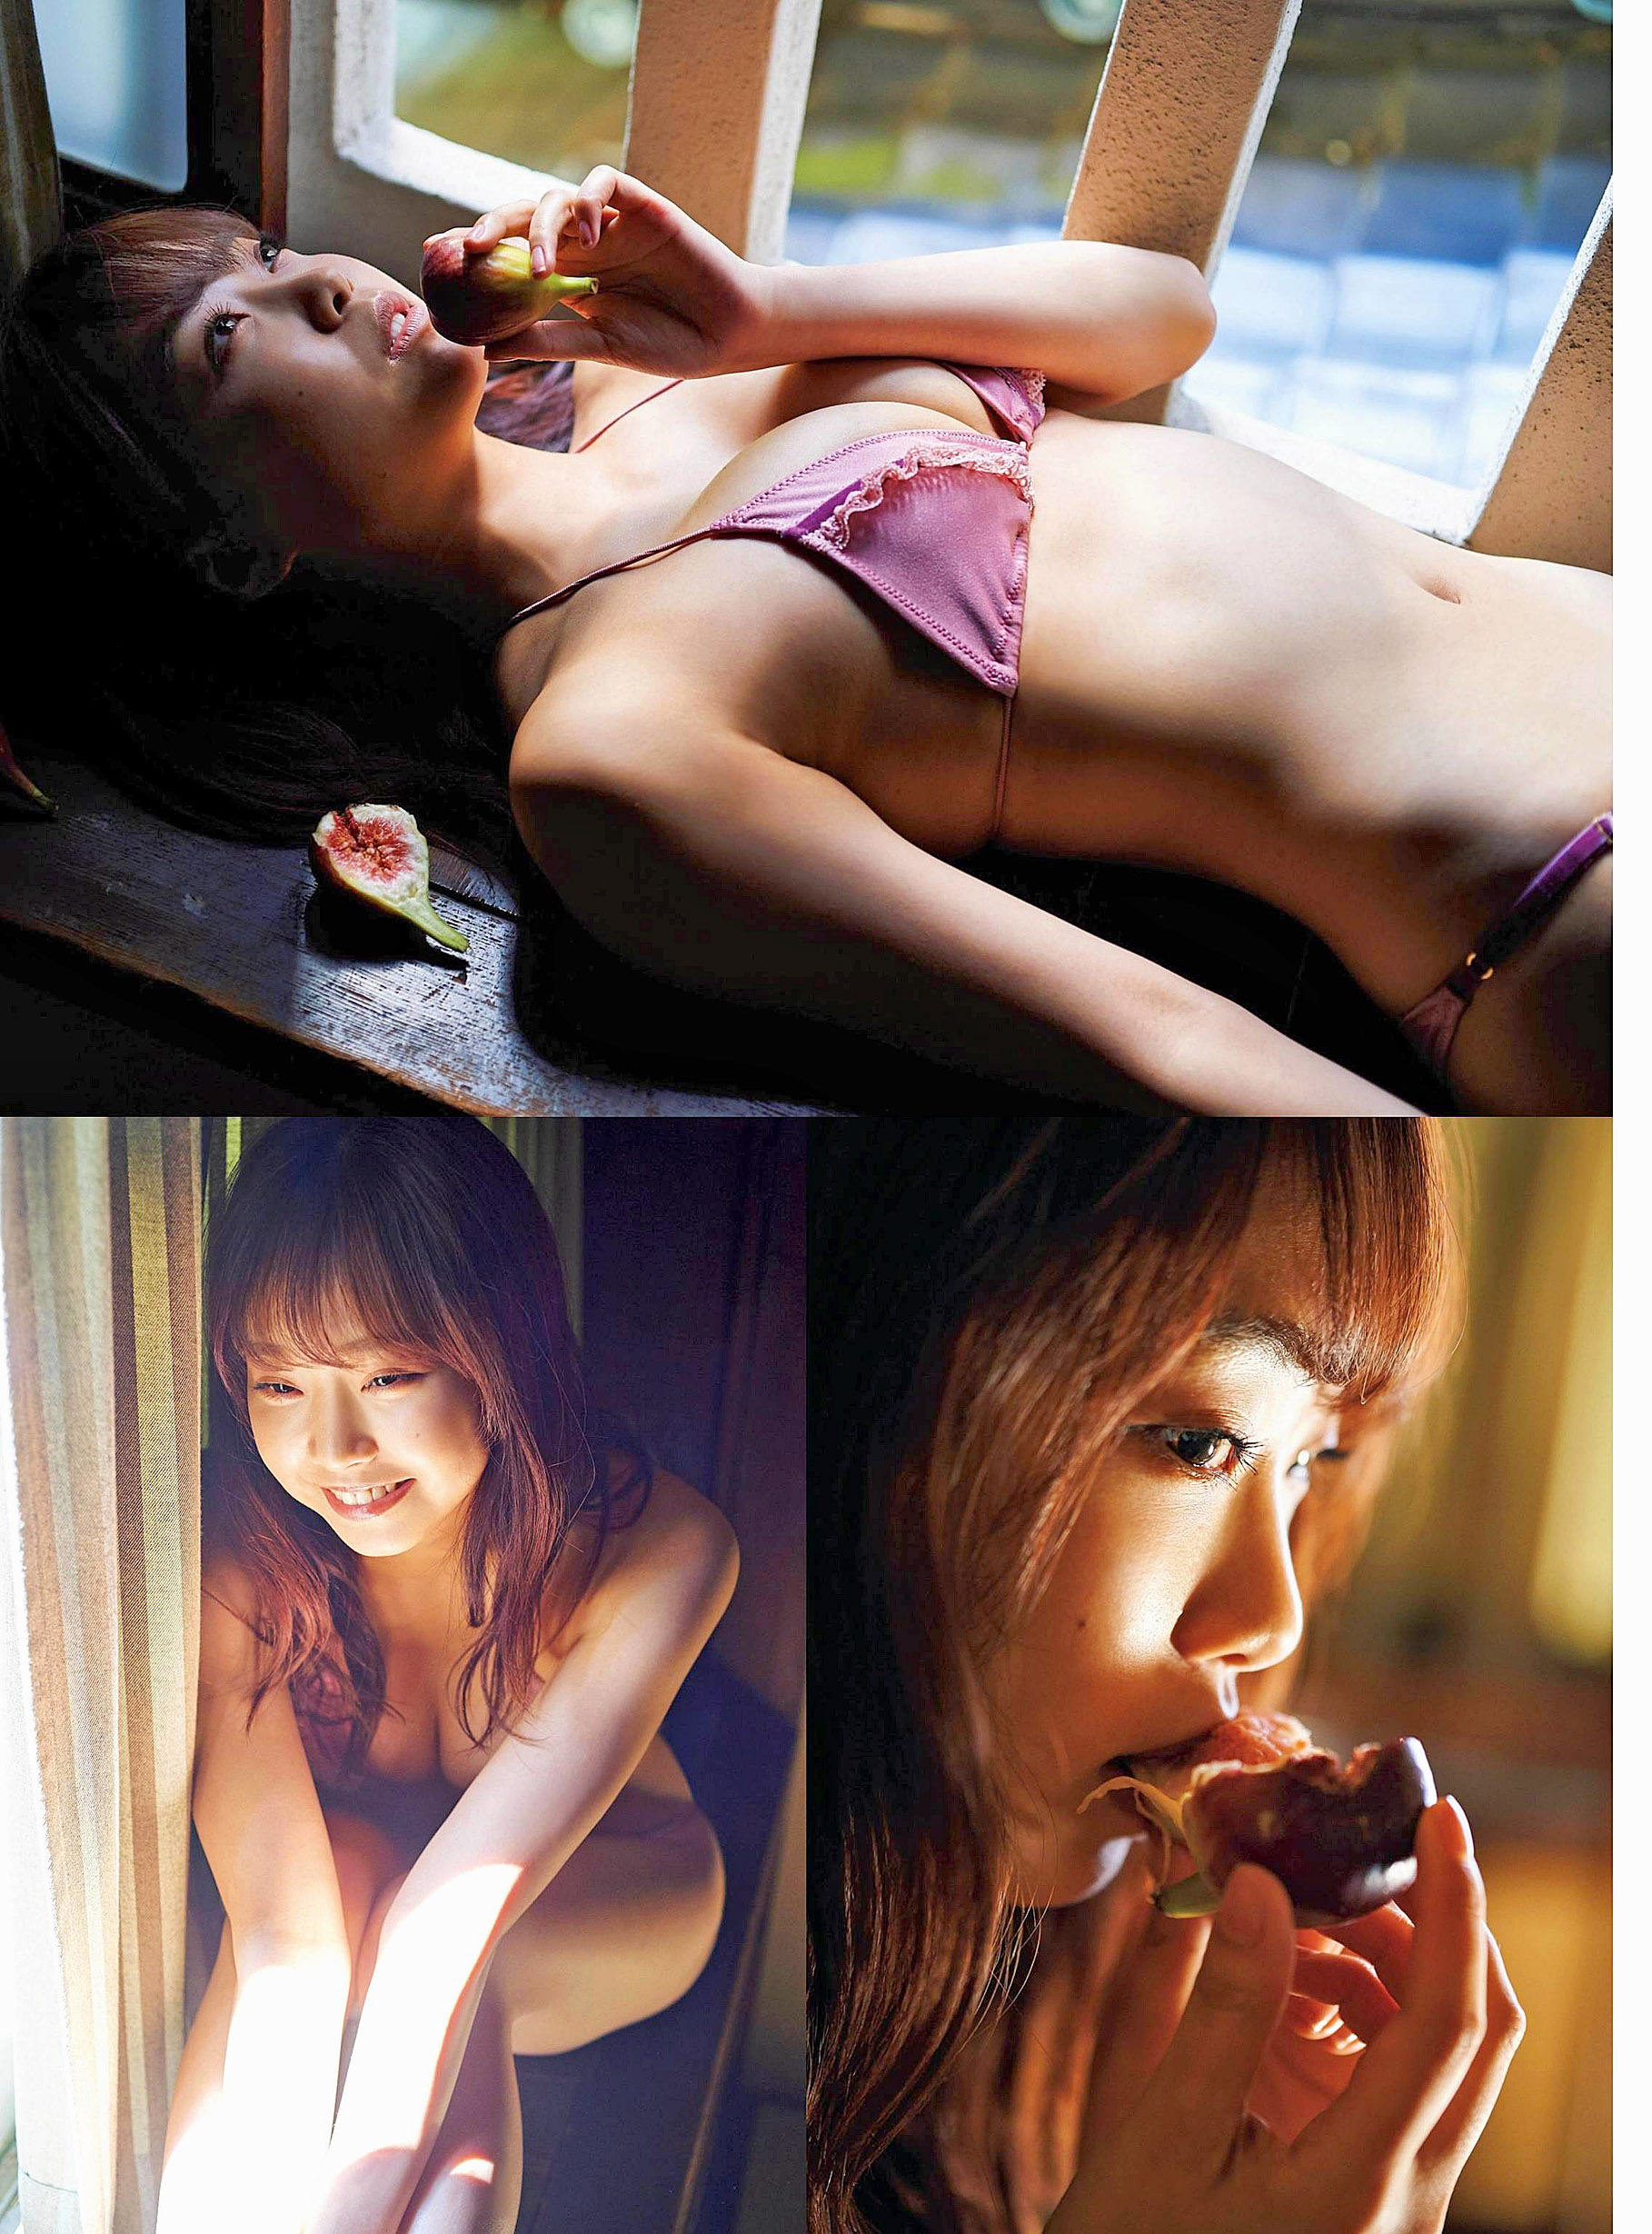 Yuuka Kato NMB48 EnTame 2001 04.jpg